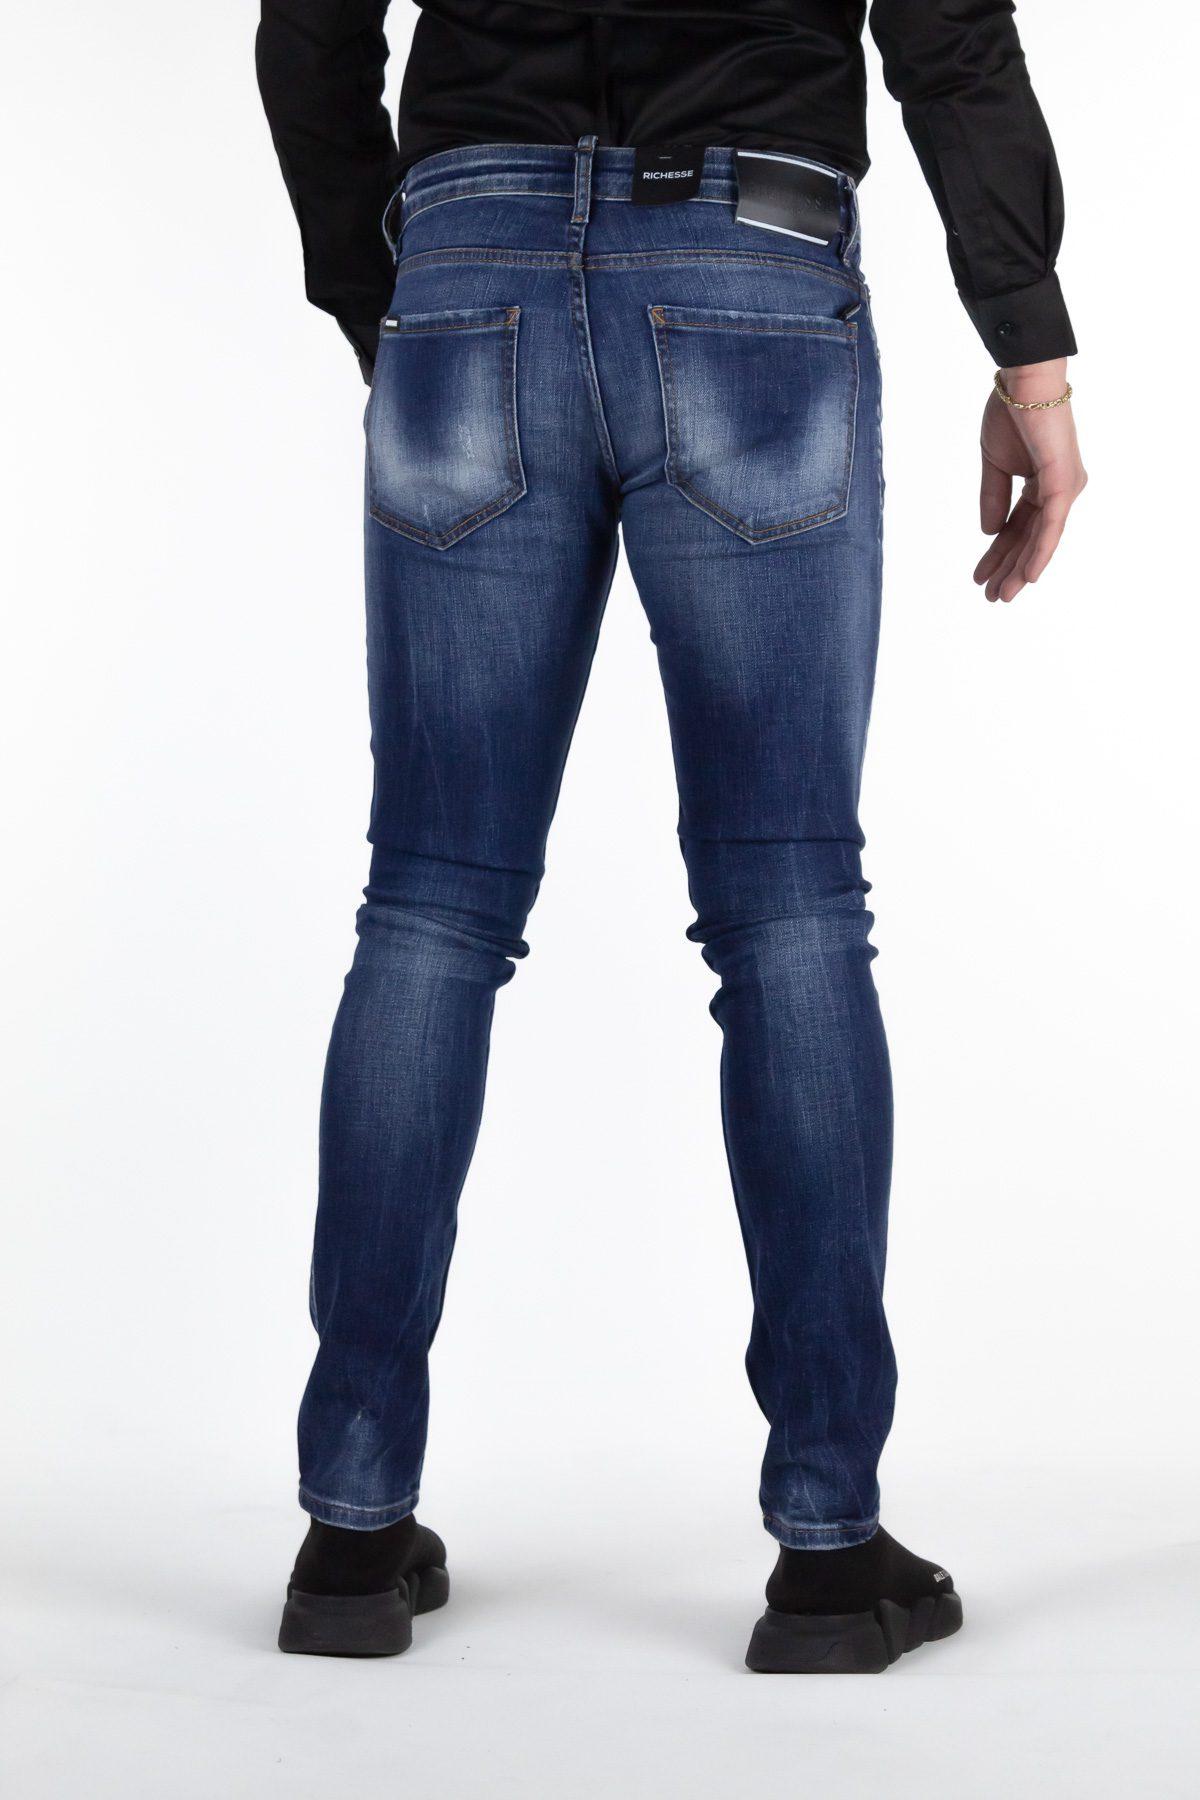 Richesse Charleroi Blue Jeans 2240-4